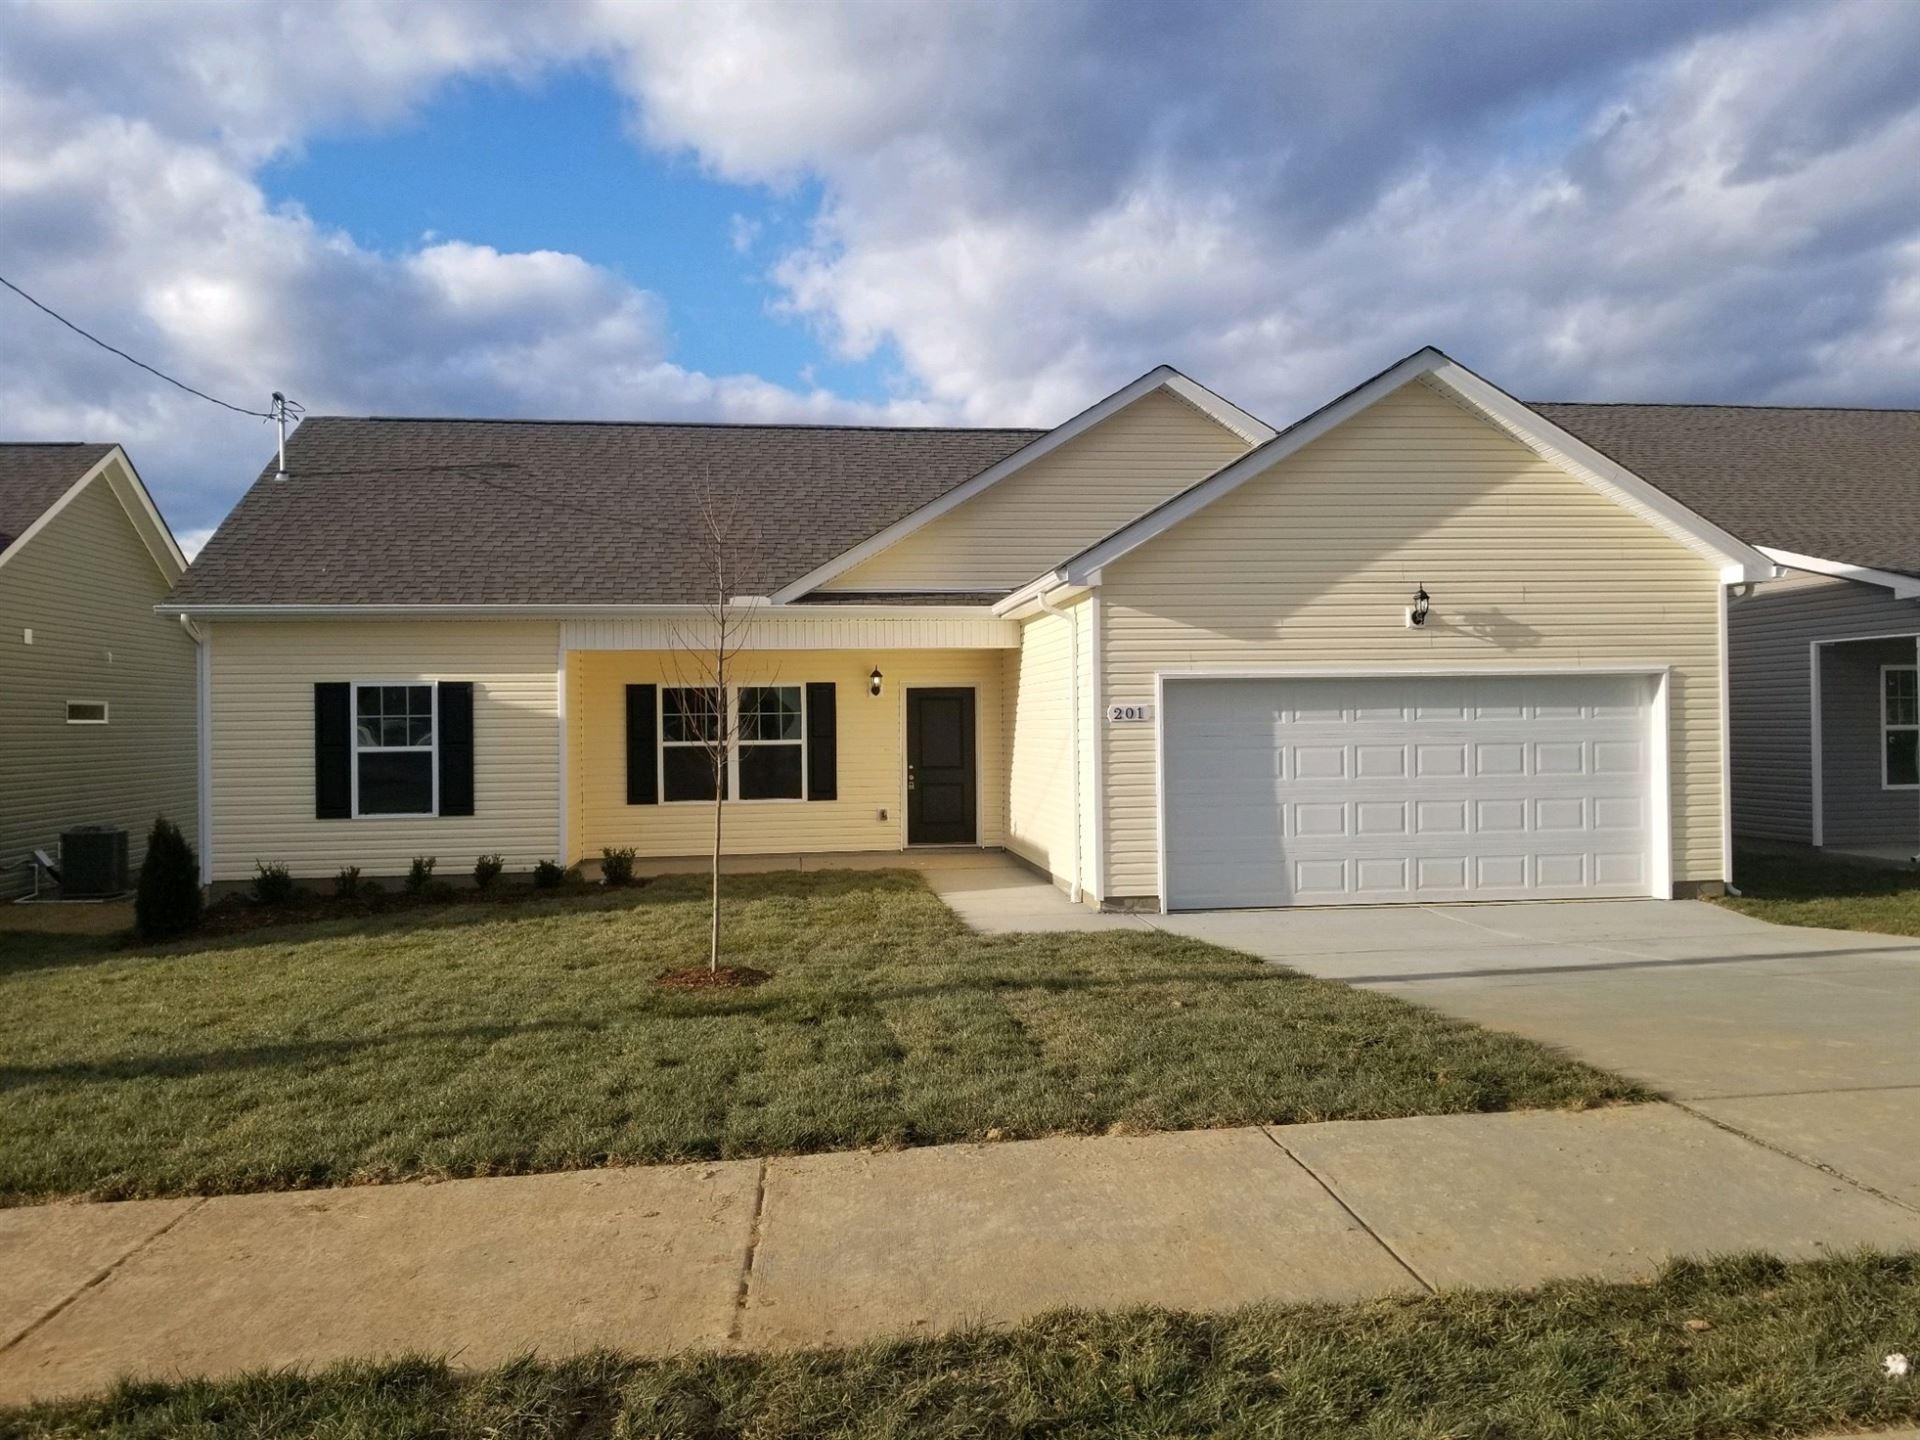 113 Equestrian Way, Shelbyville, TN 37160 - MLS#: 2203763